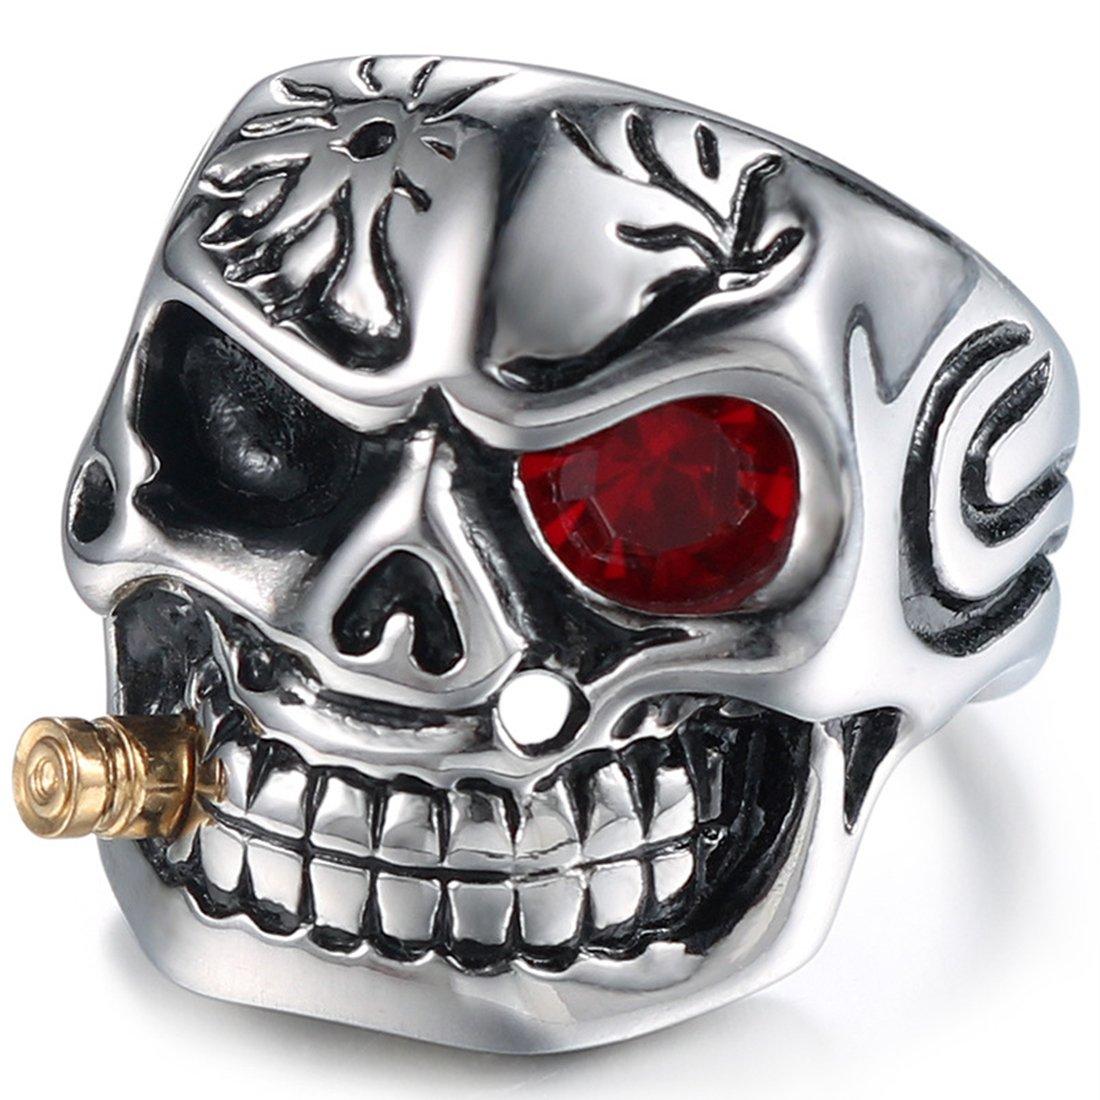 DALARAN Anillos de acero inoxidable para hombres Cigar Skull Ring Gothic Band Rojo/Ojo transparente